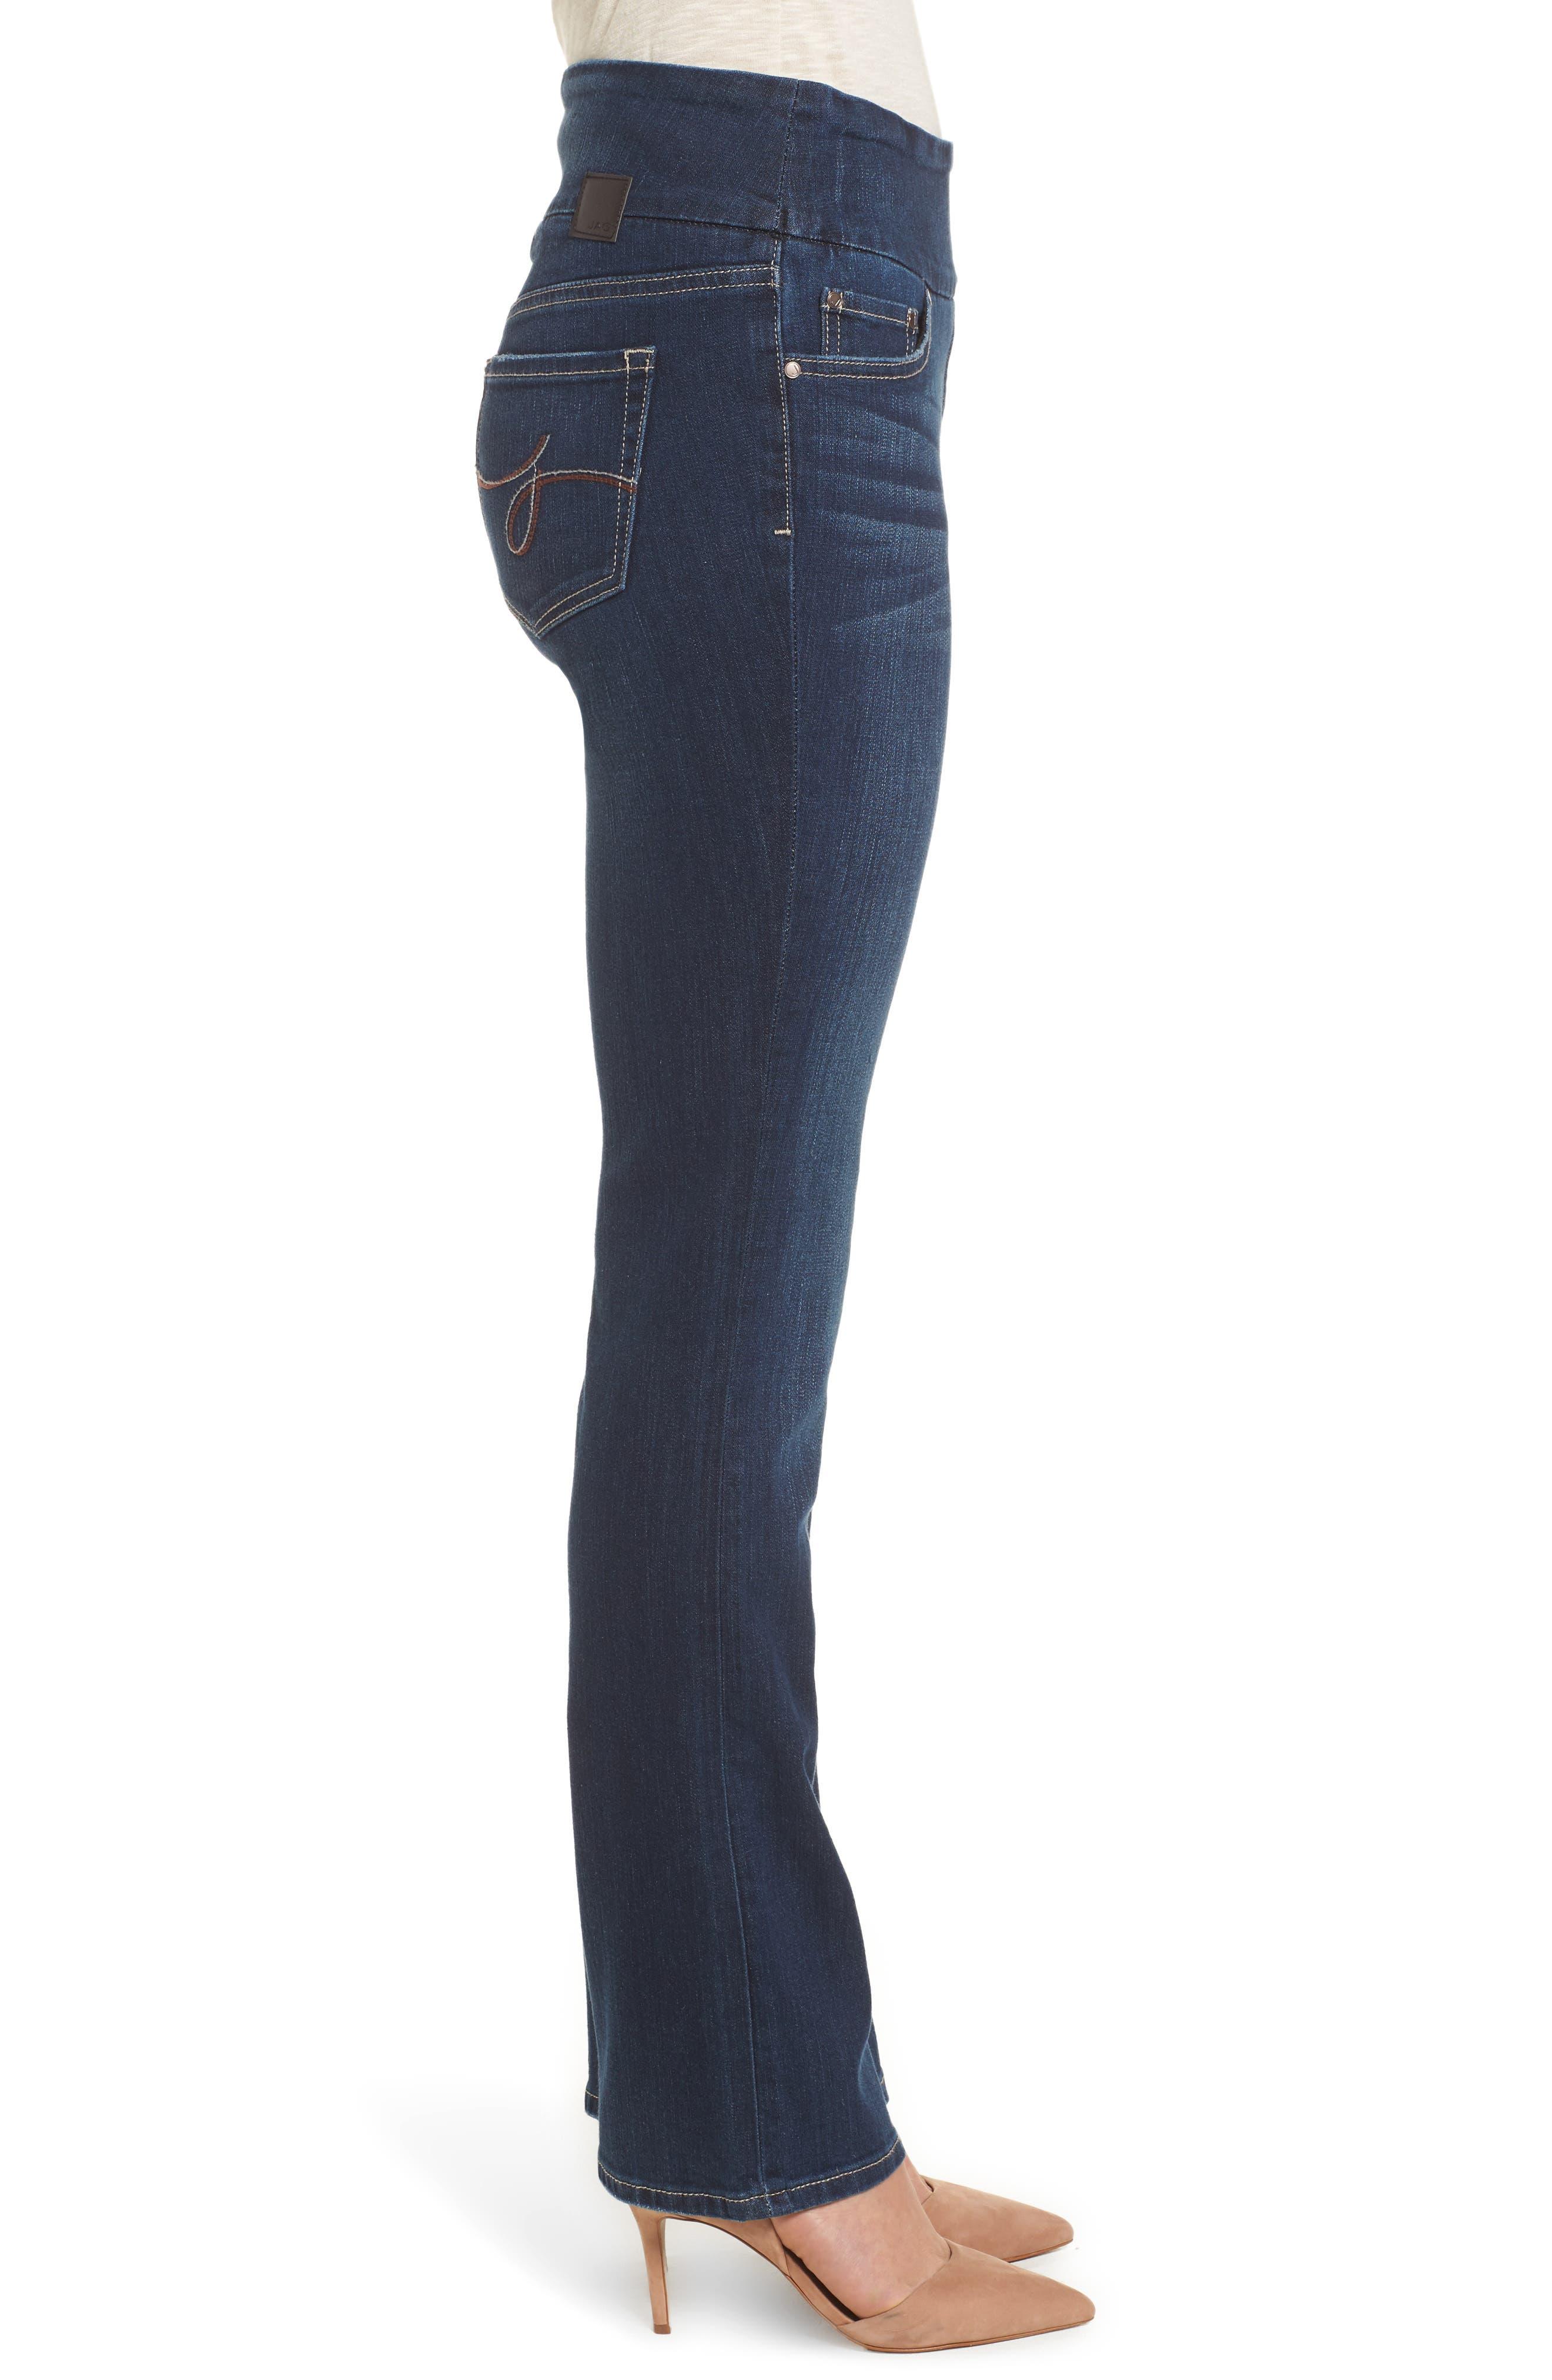 Paley Stretch Bootcut Jeans,                             Alternate thumbnail 3, color,                             Dark Indigo